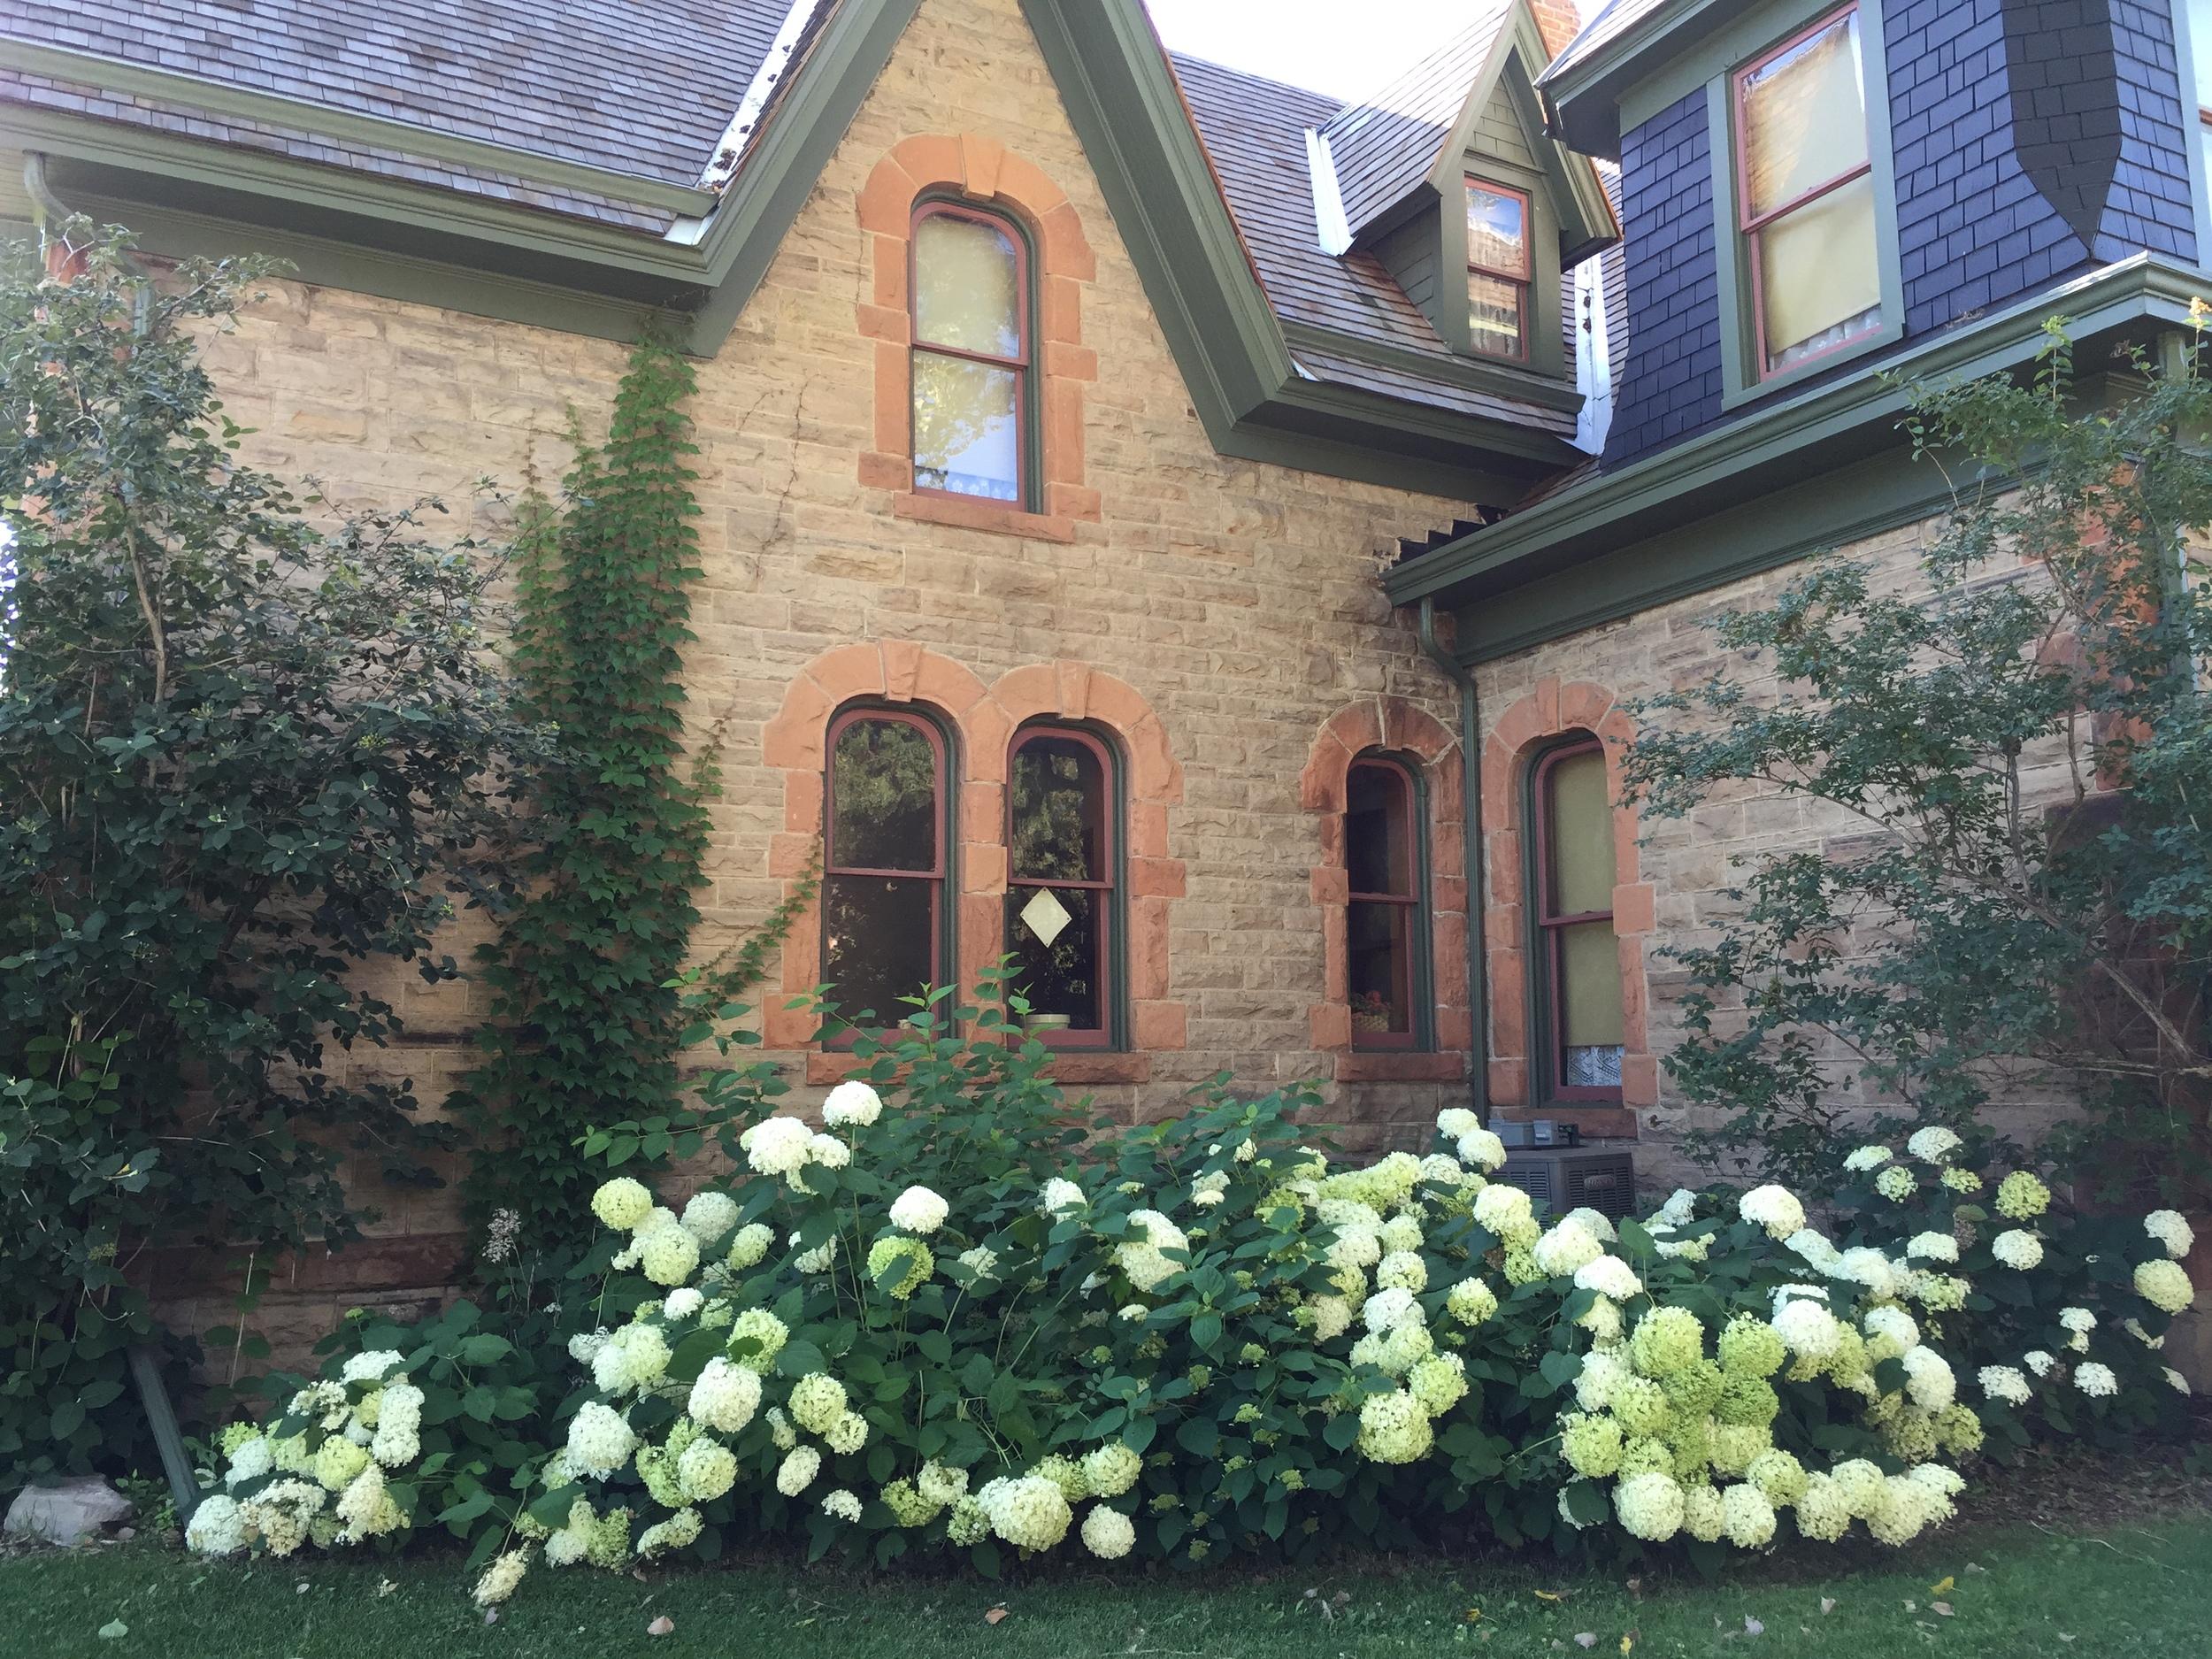 1-Avery-House-Summer-2015-snowball-bushes.JPG